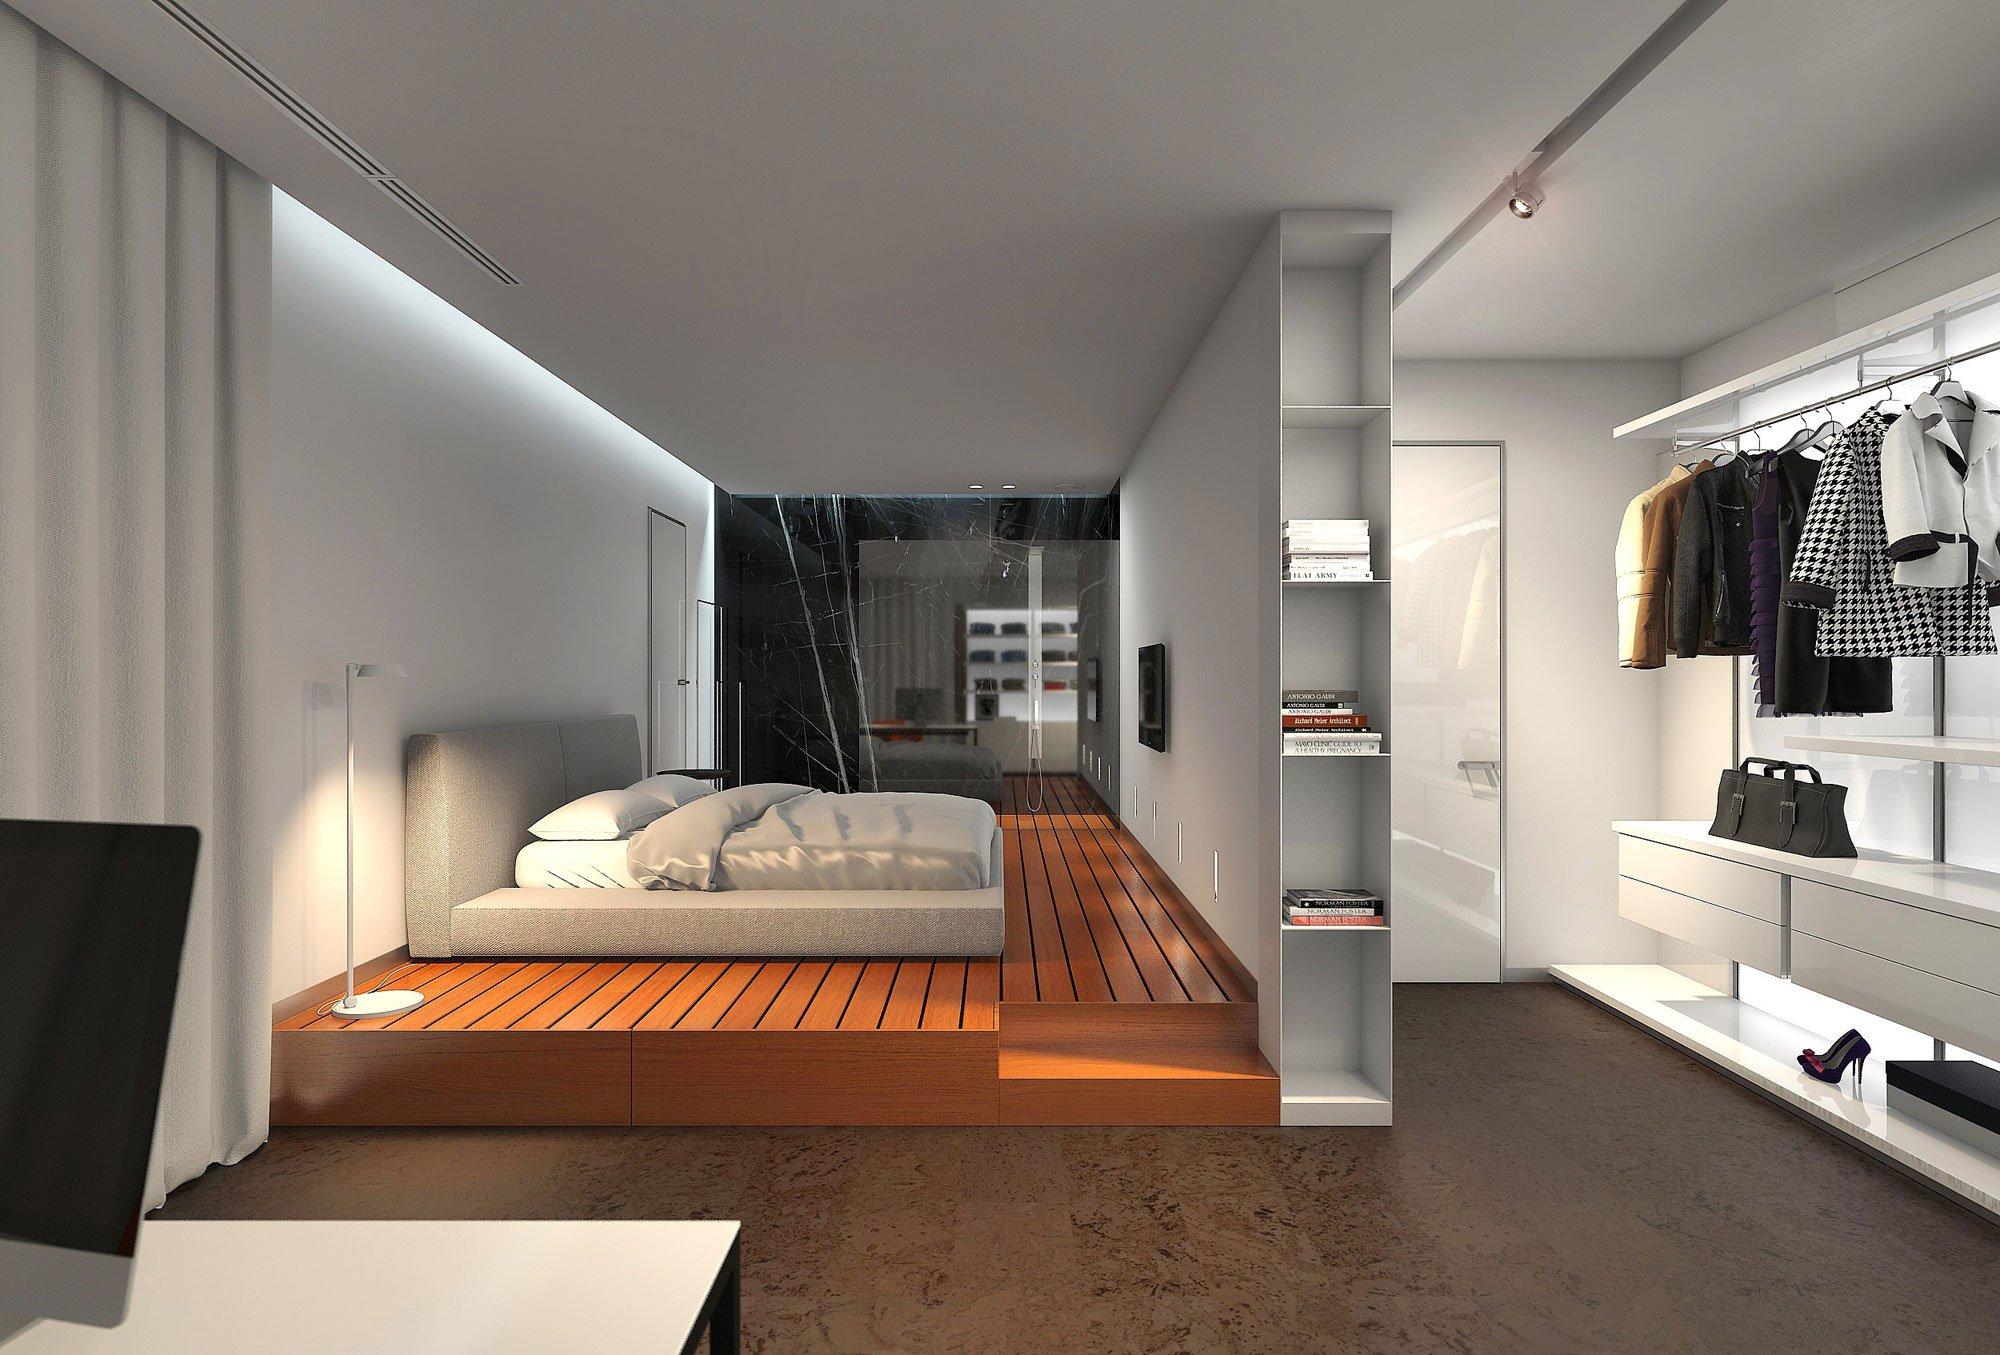 dise o de dormitorio construye hogar